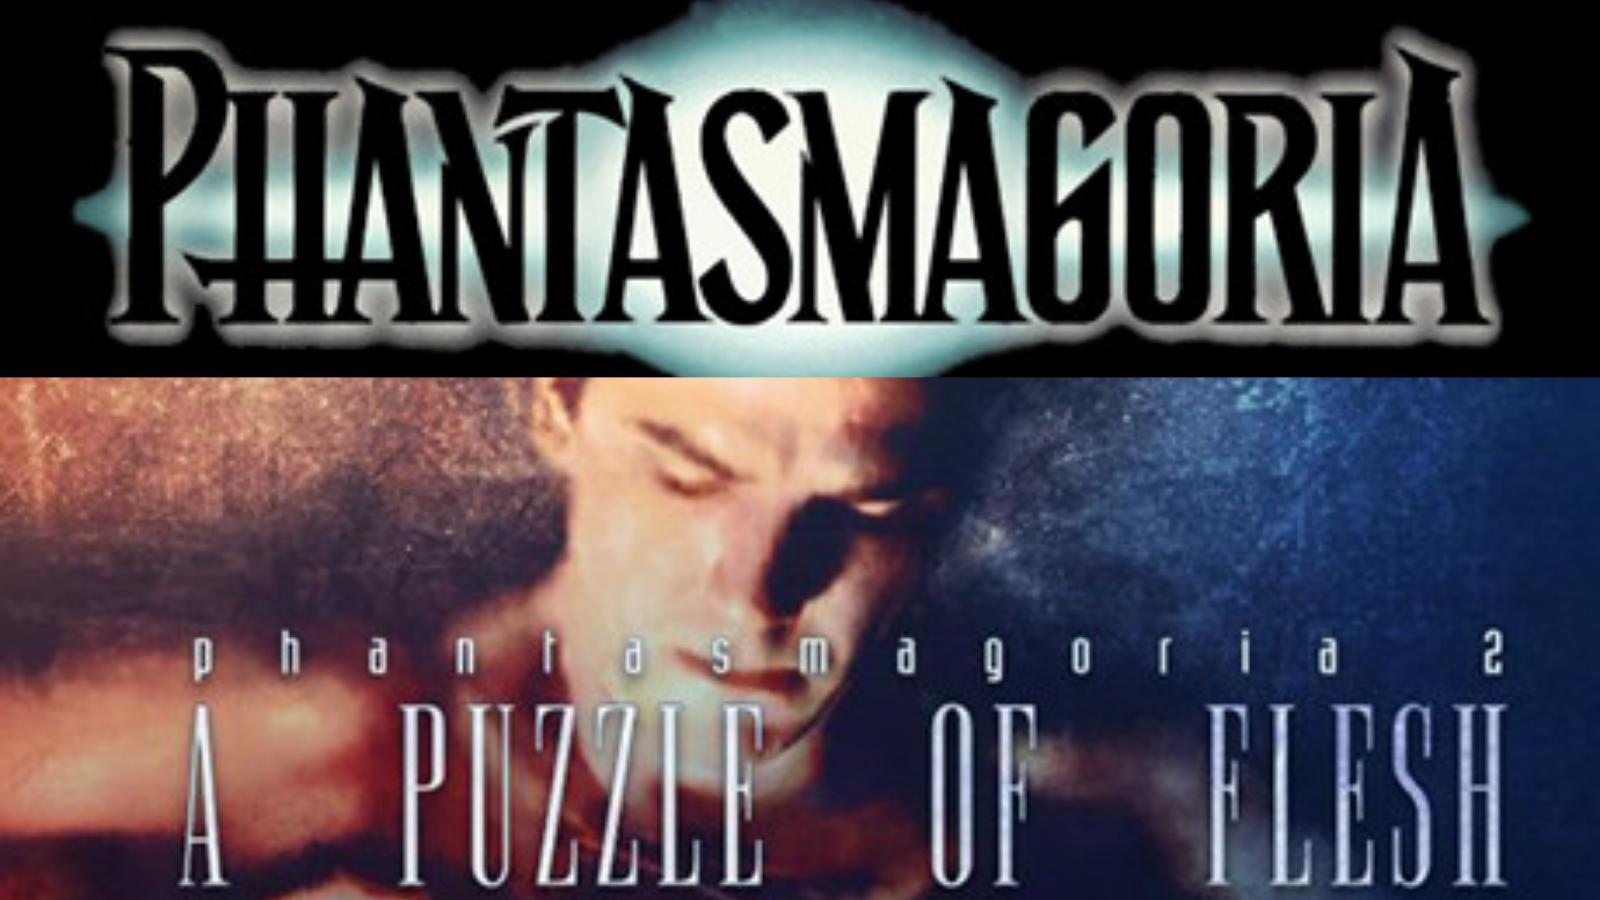 Phantasmagoria 1 and 2 Logo